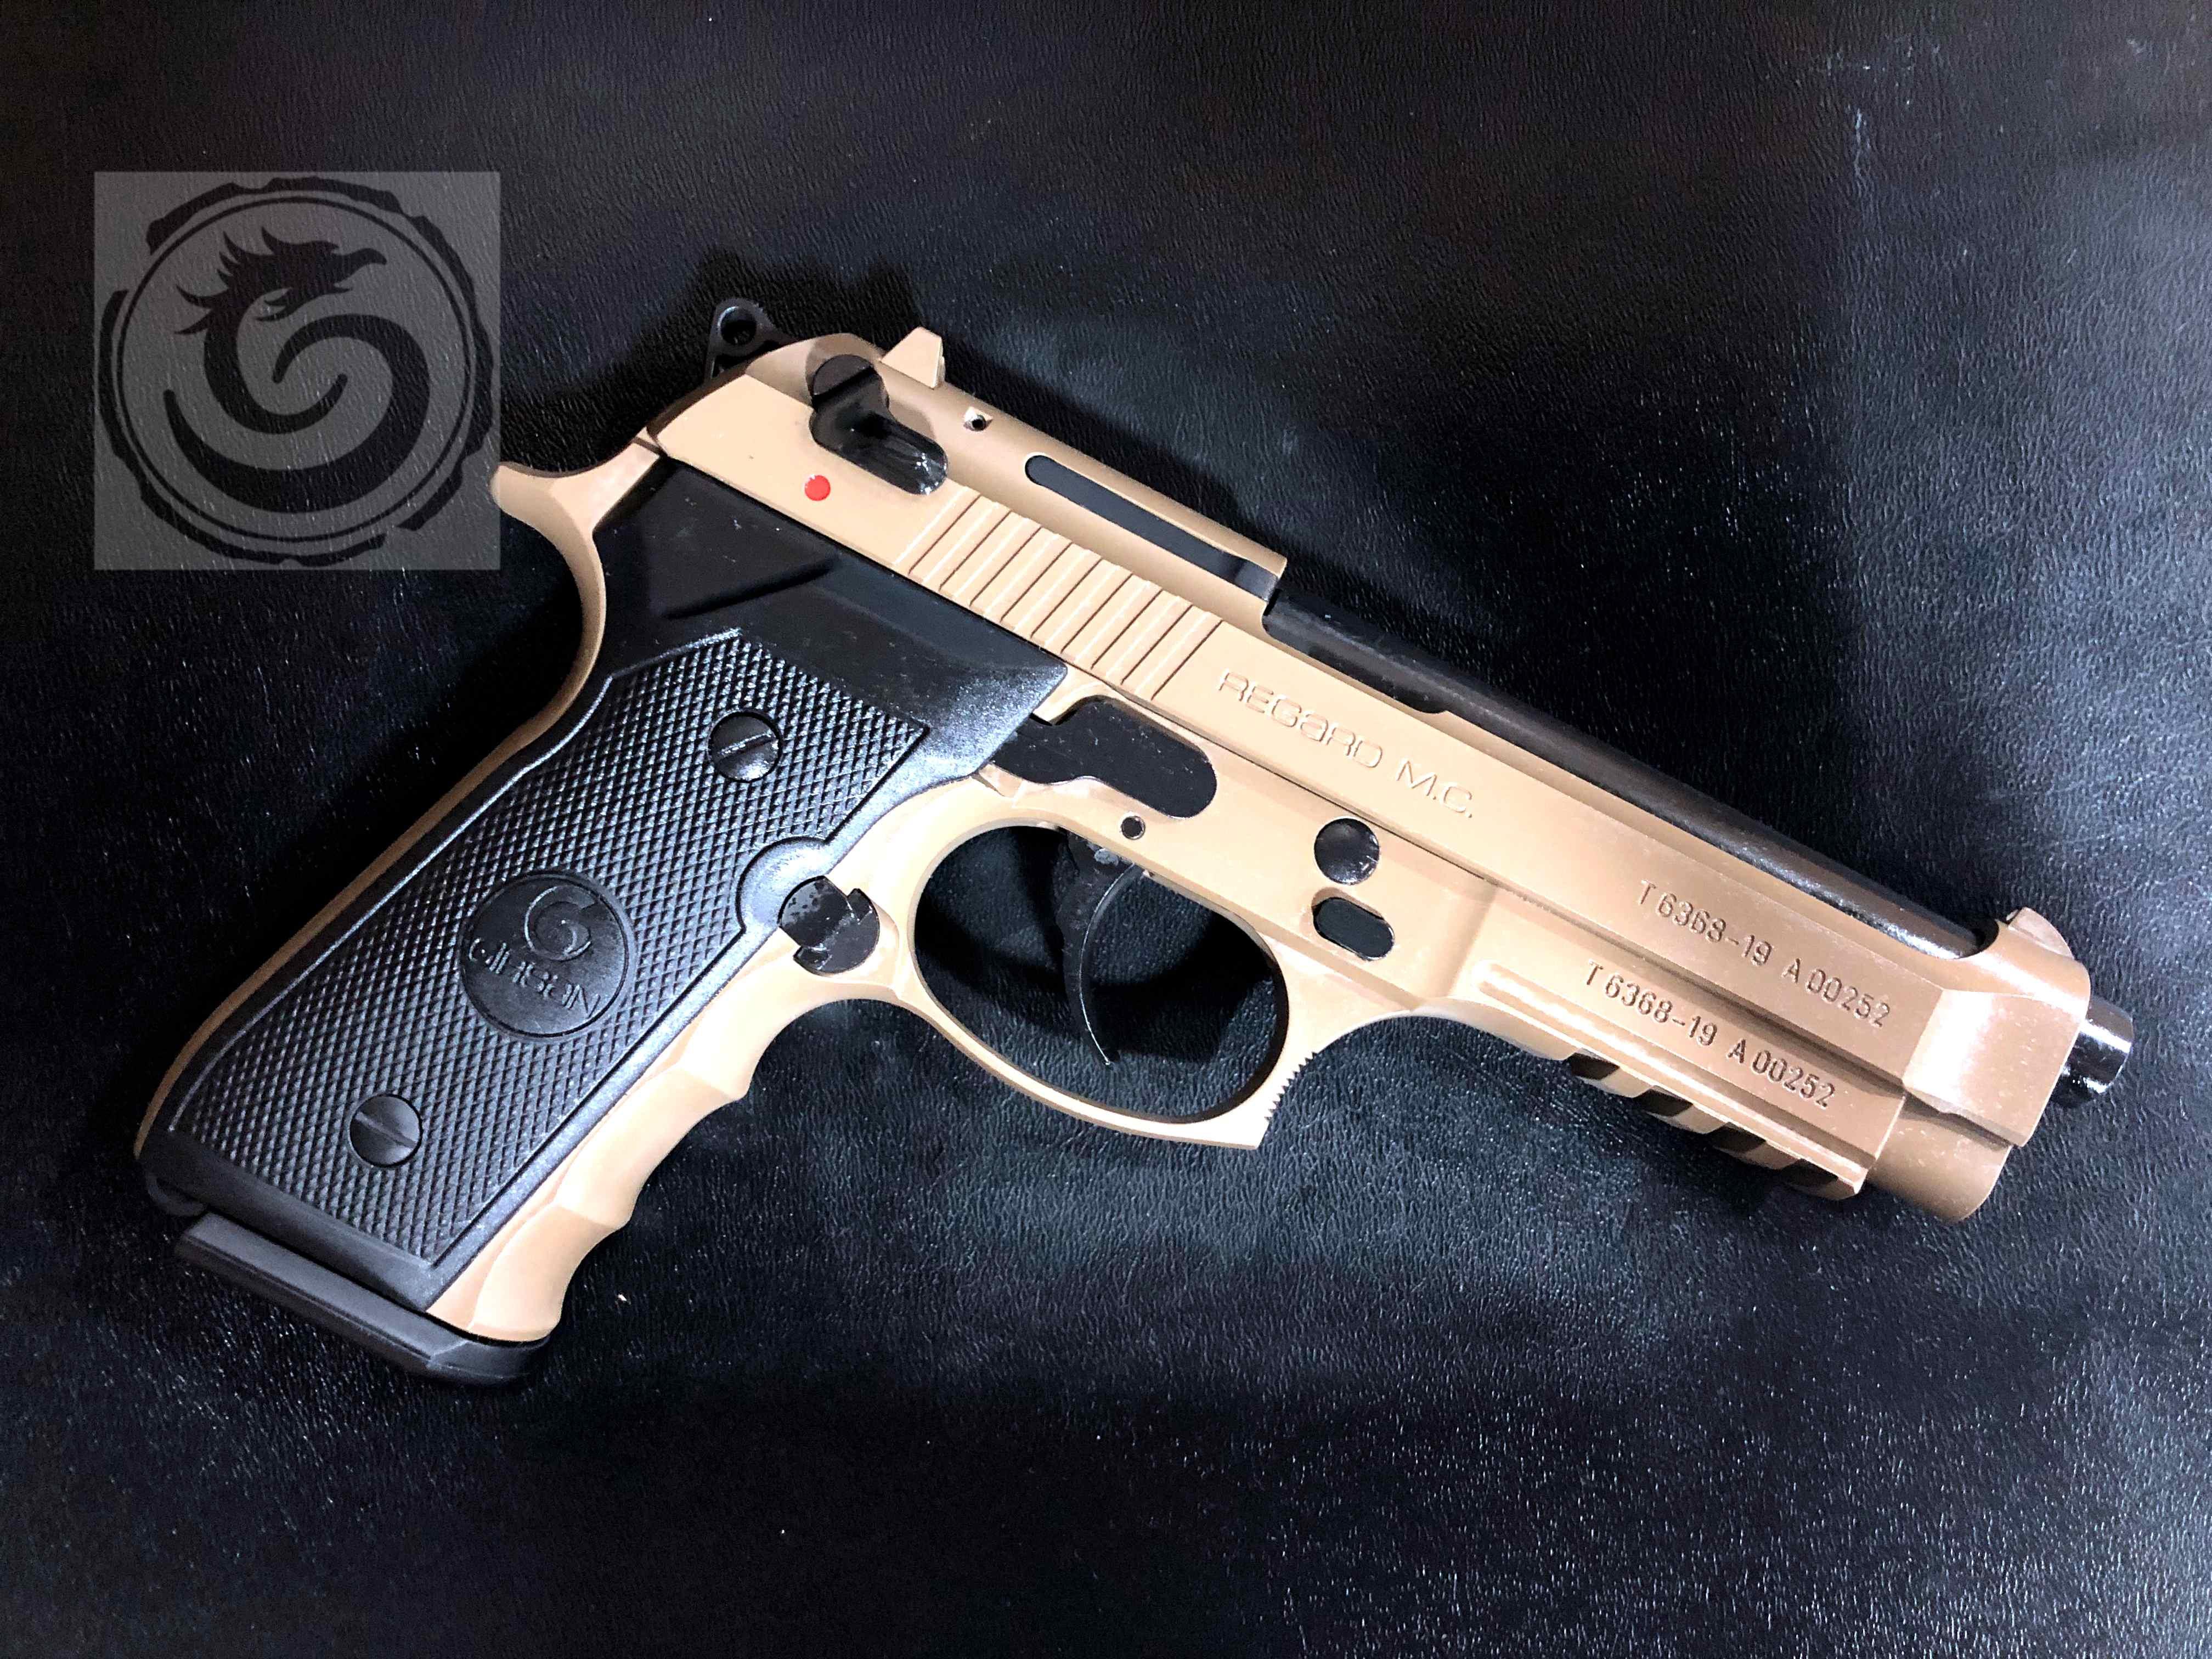 Girsan Regard MC Semi-Auto Pistol Dark Earth 9mm